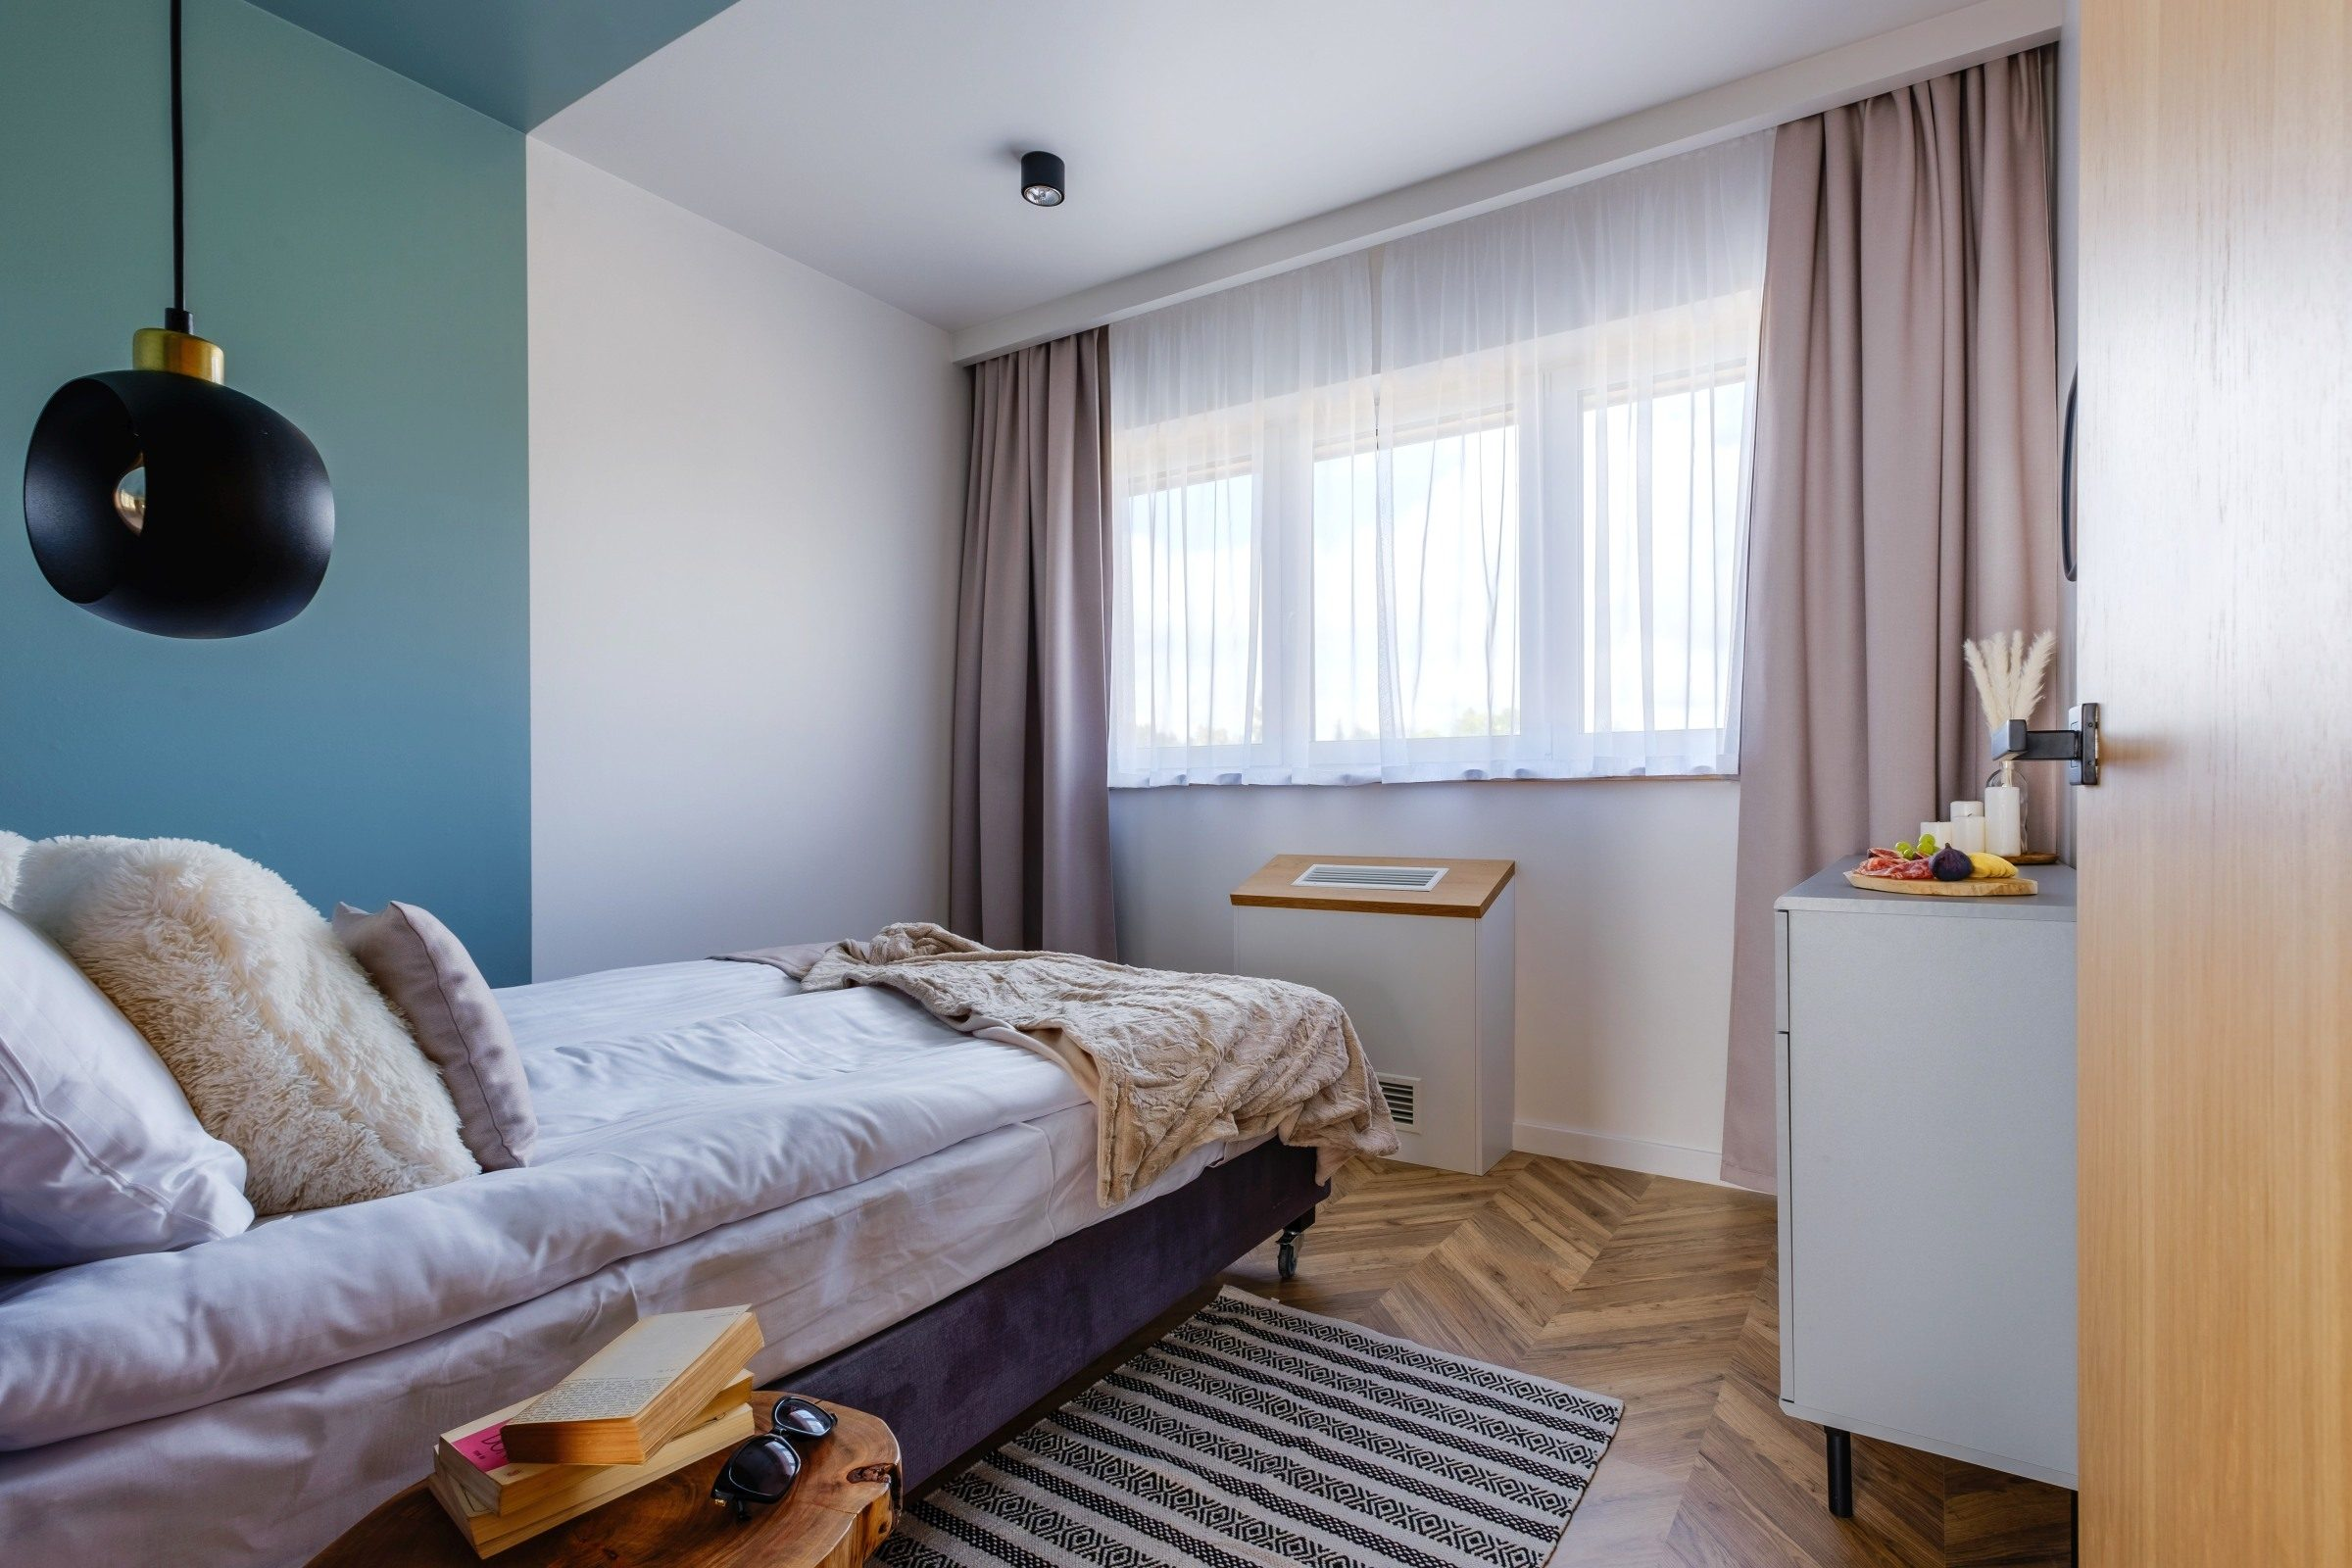 Apartamenty NOVA BIAŁKA Białka Tatrzańska apartament 7 sypialnia 3